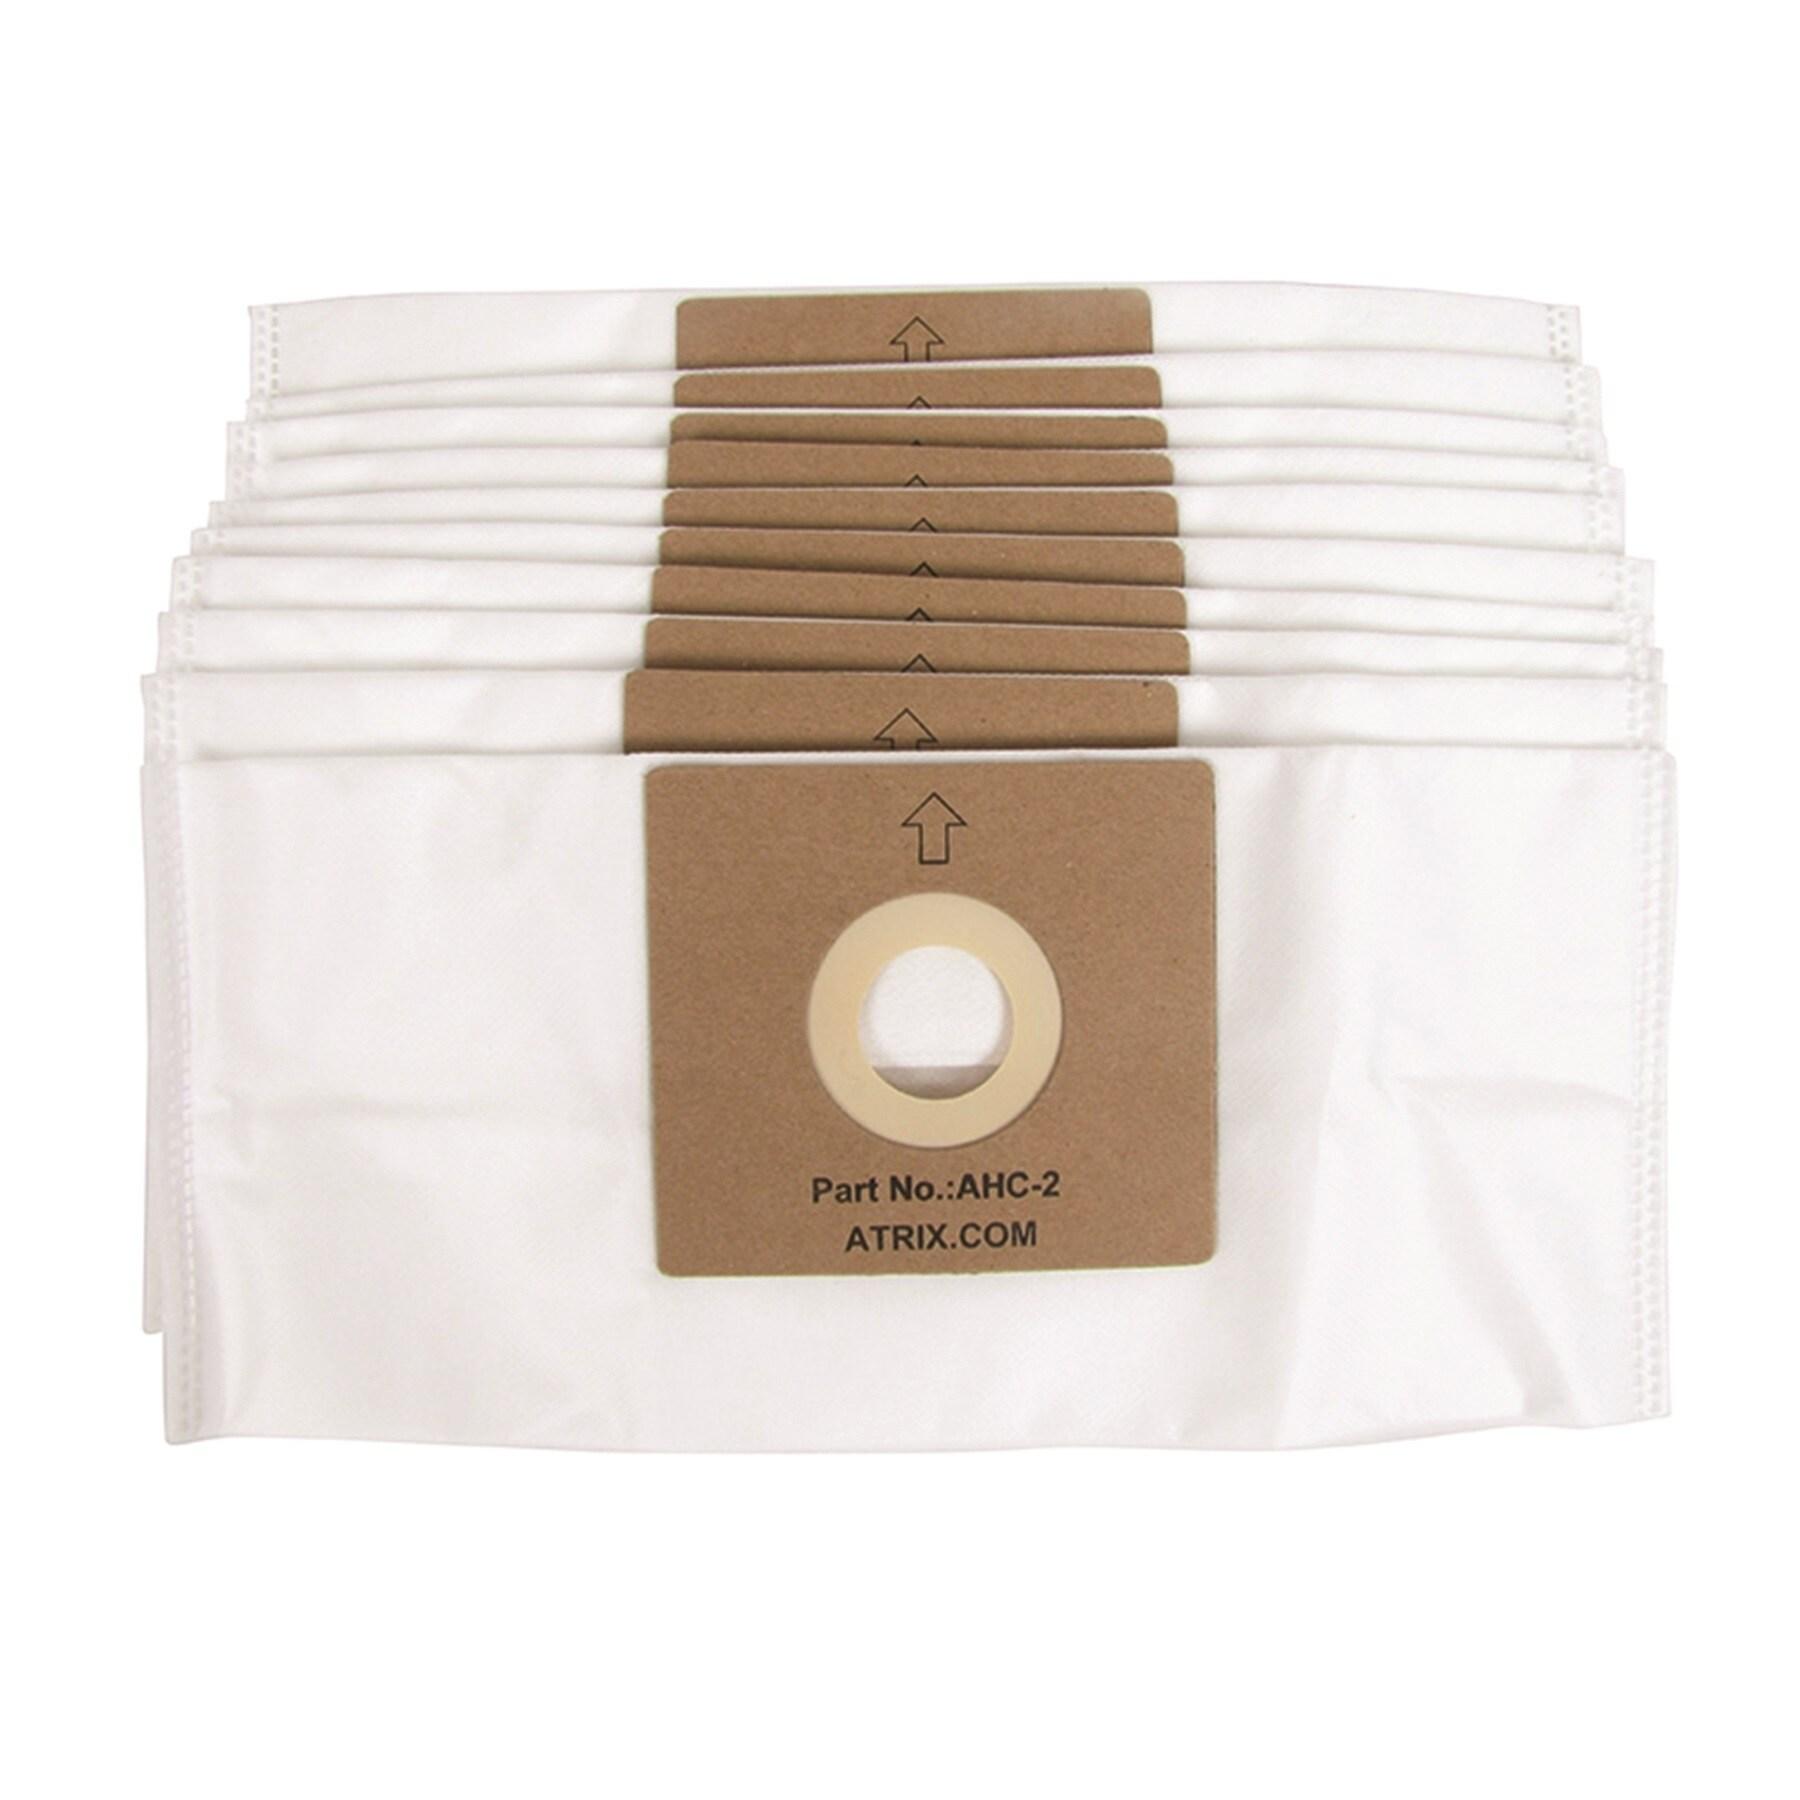 ATRIX Hepa White Vacuum Filter Bags Bags for AHC-1 (Pack ...